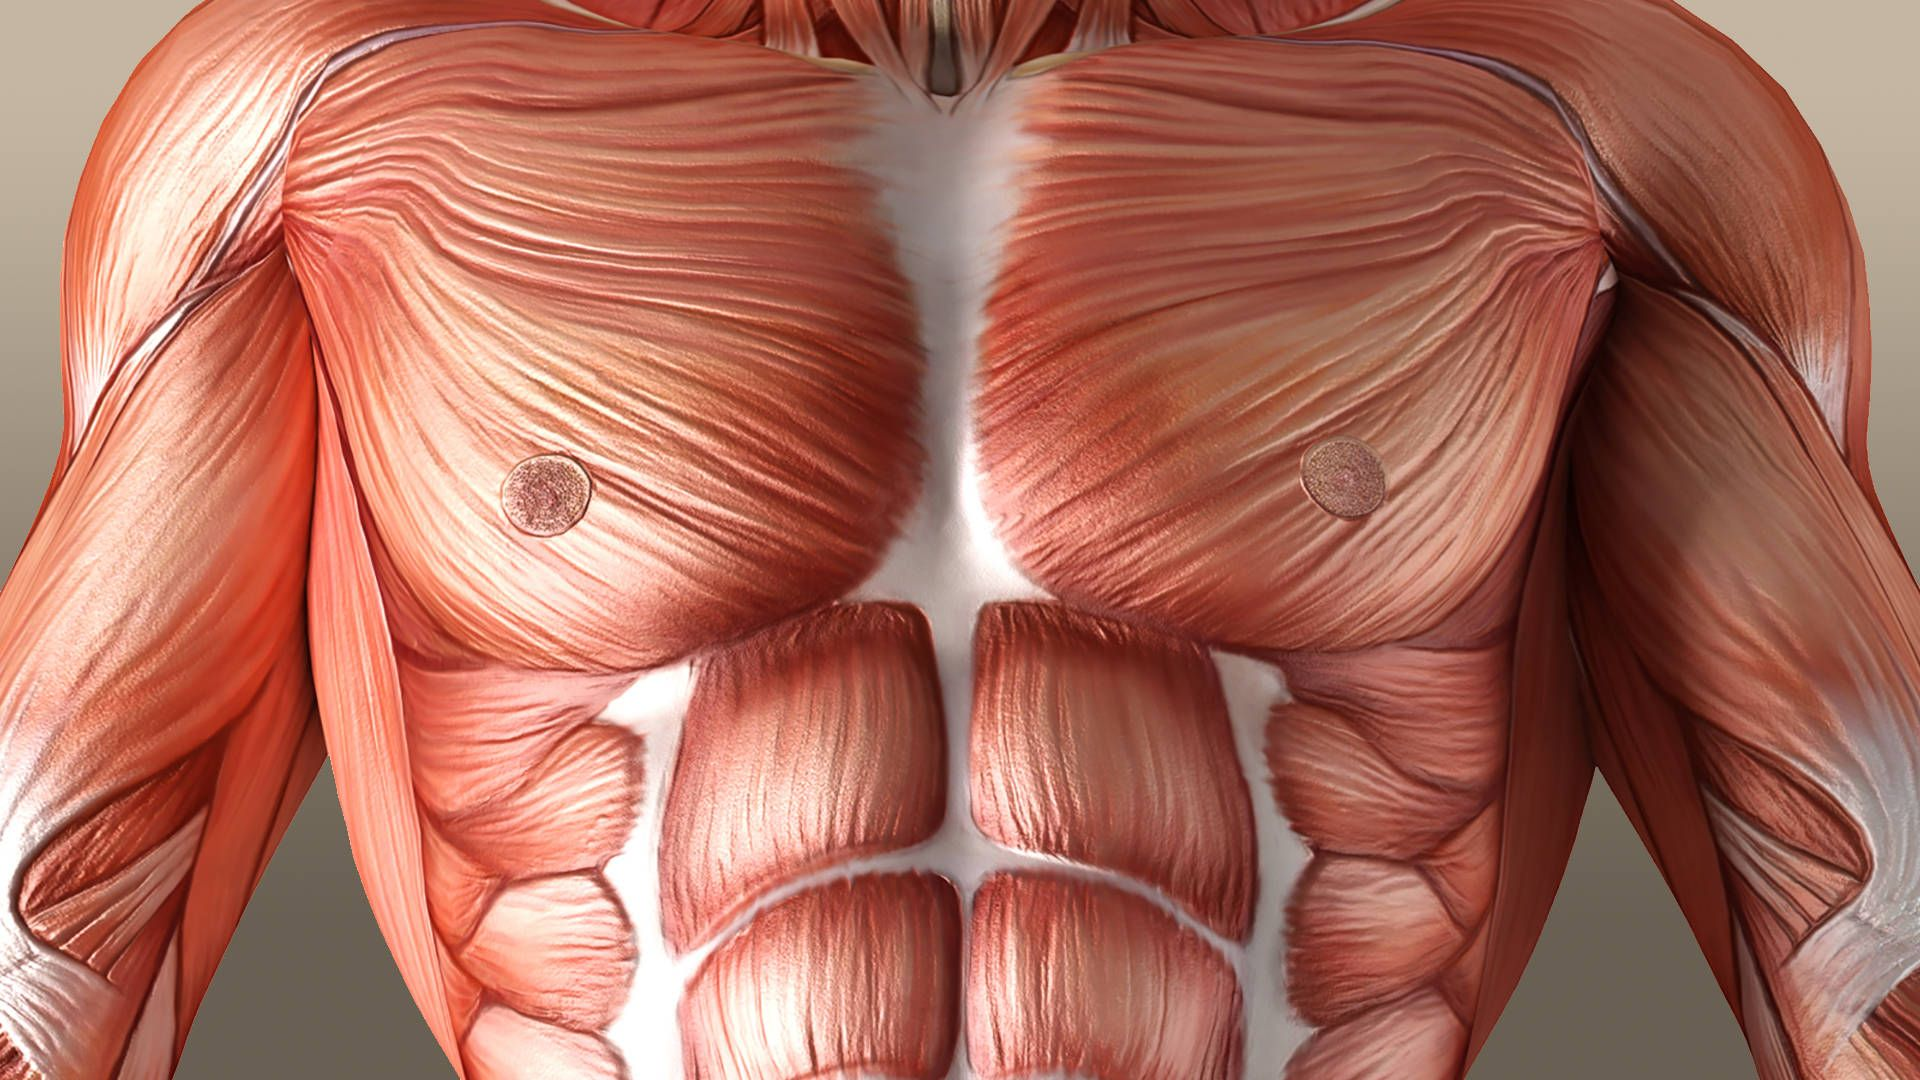 Living Well Therapeutic Massage Greenwood, SC | Greenwood, SC ...